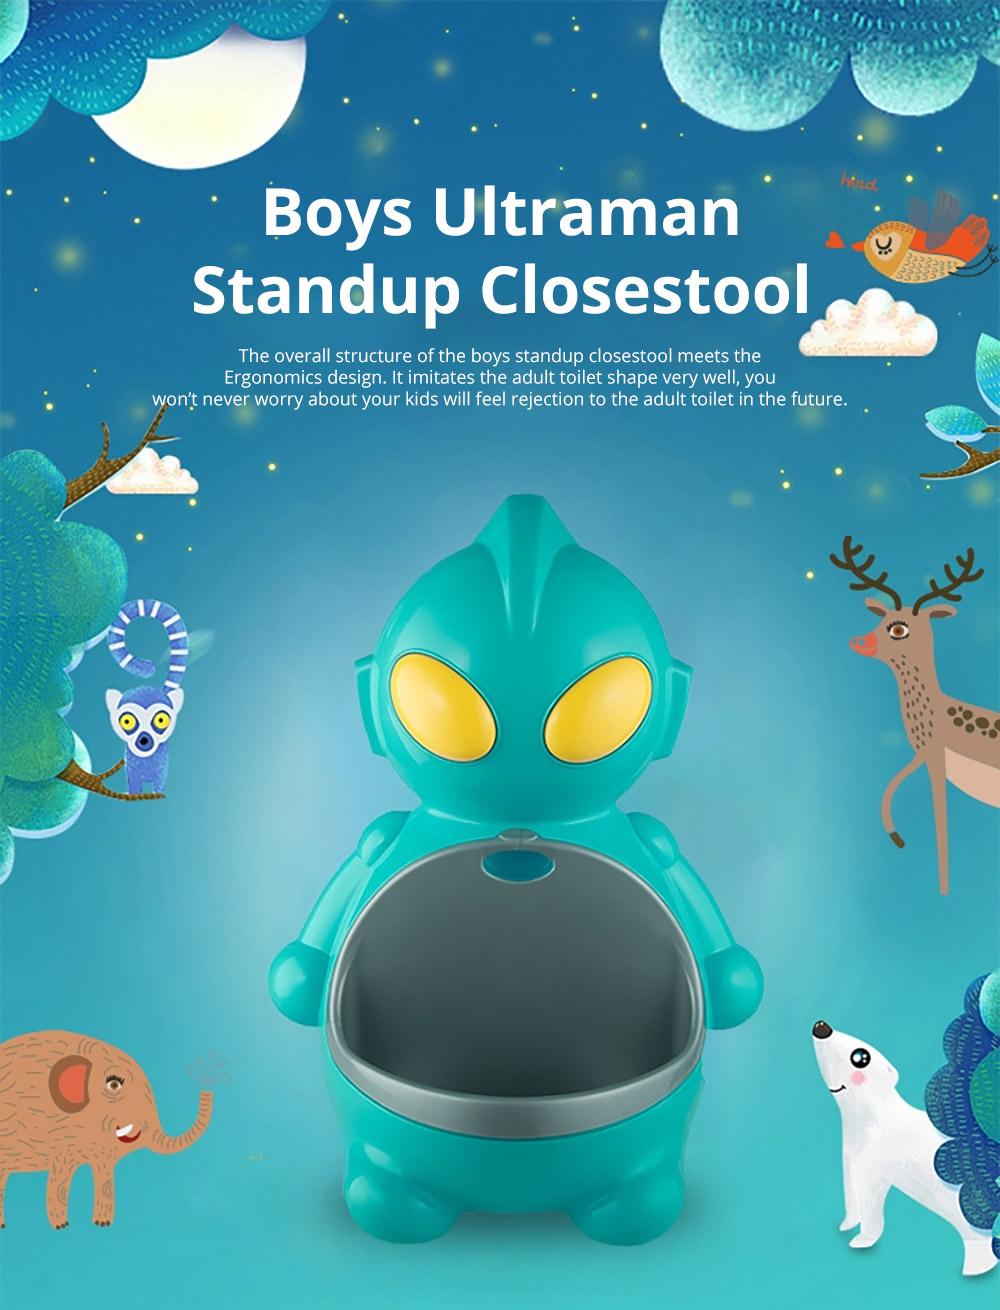 Boys Ultraman Standup Closestool